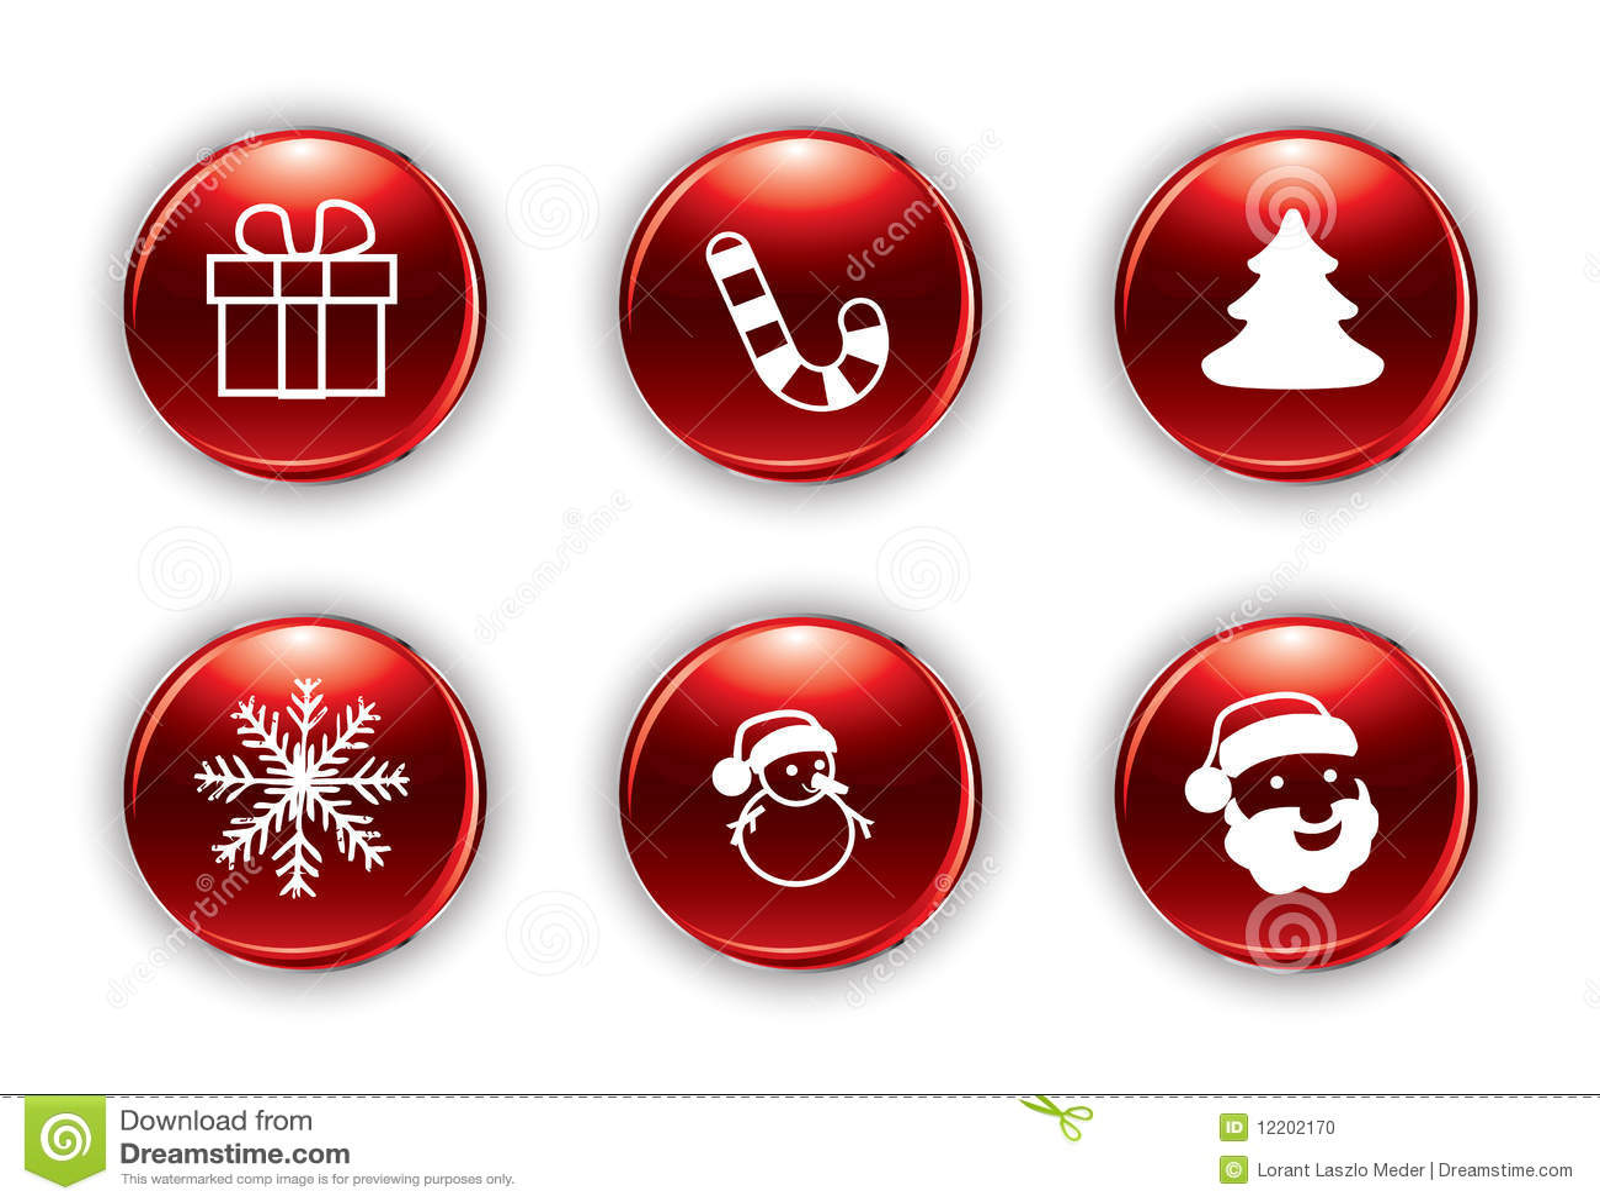 vector christmas buttons - Christmas Buttons